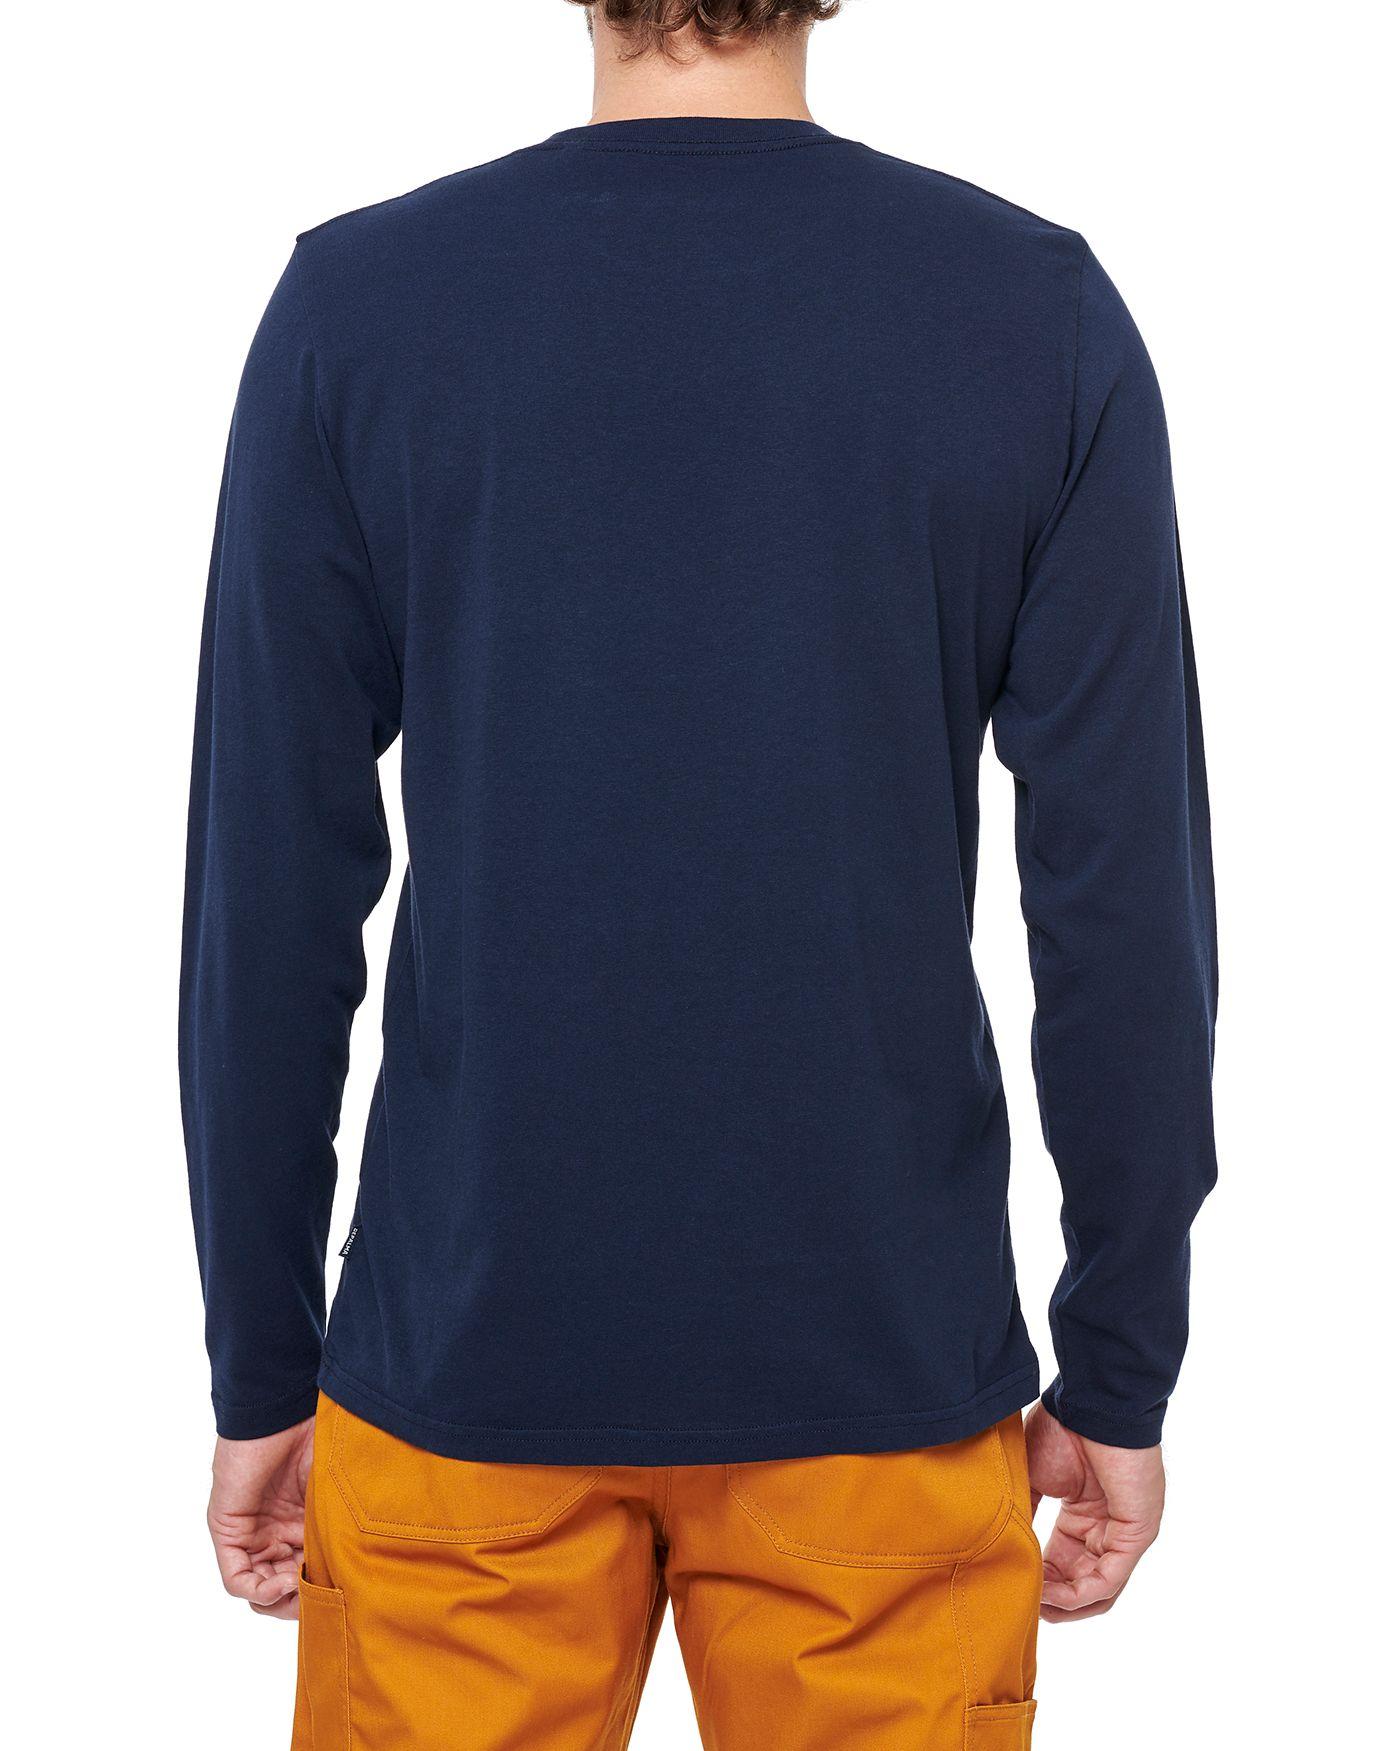 Photo of Thunder L/S T-shirt, Navy